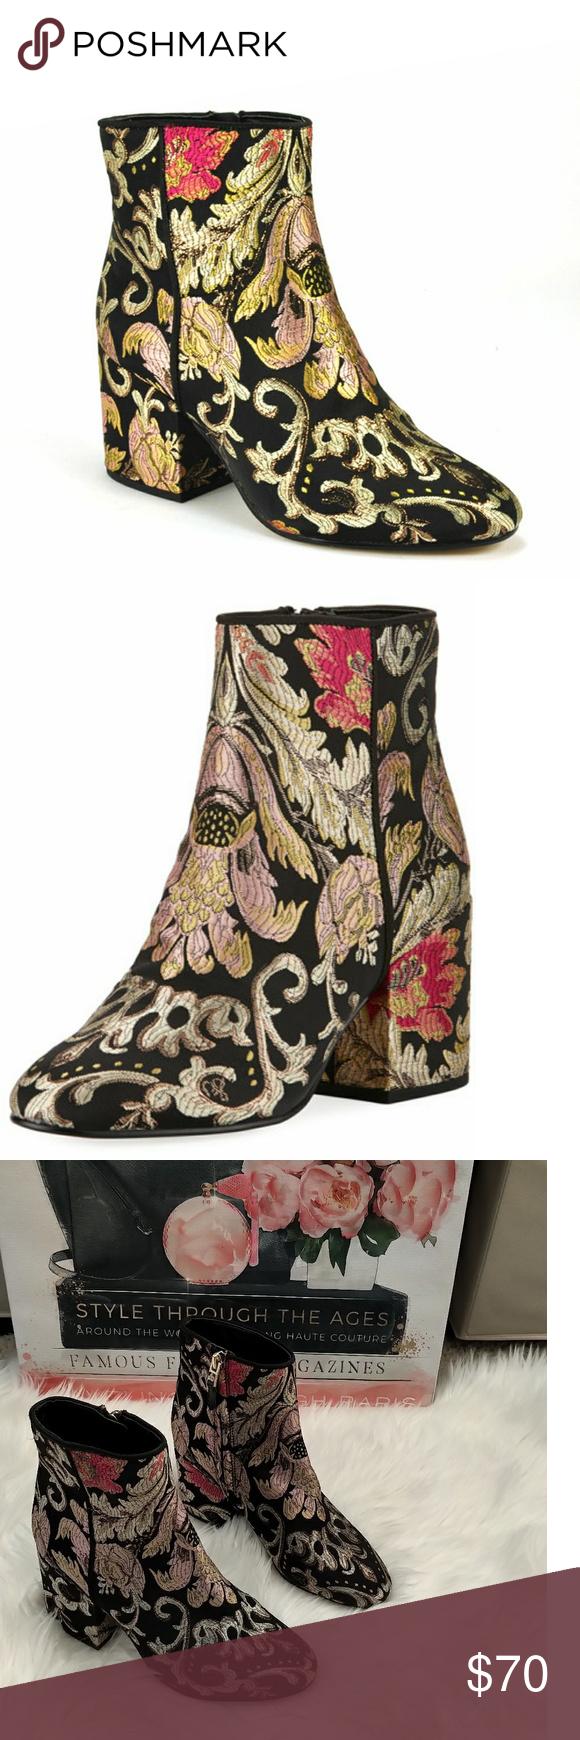 9a6cc1f2fa82 Sam Edelman Taye Metallic Jacquard Ankle Boots Sam Edelman bootie in  metallic floral jacquard. 2